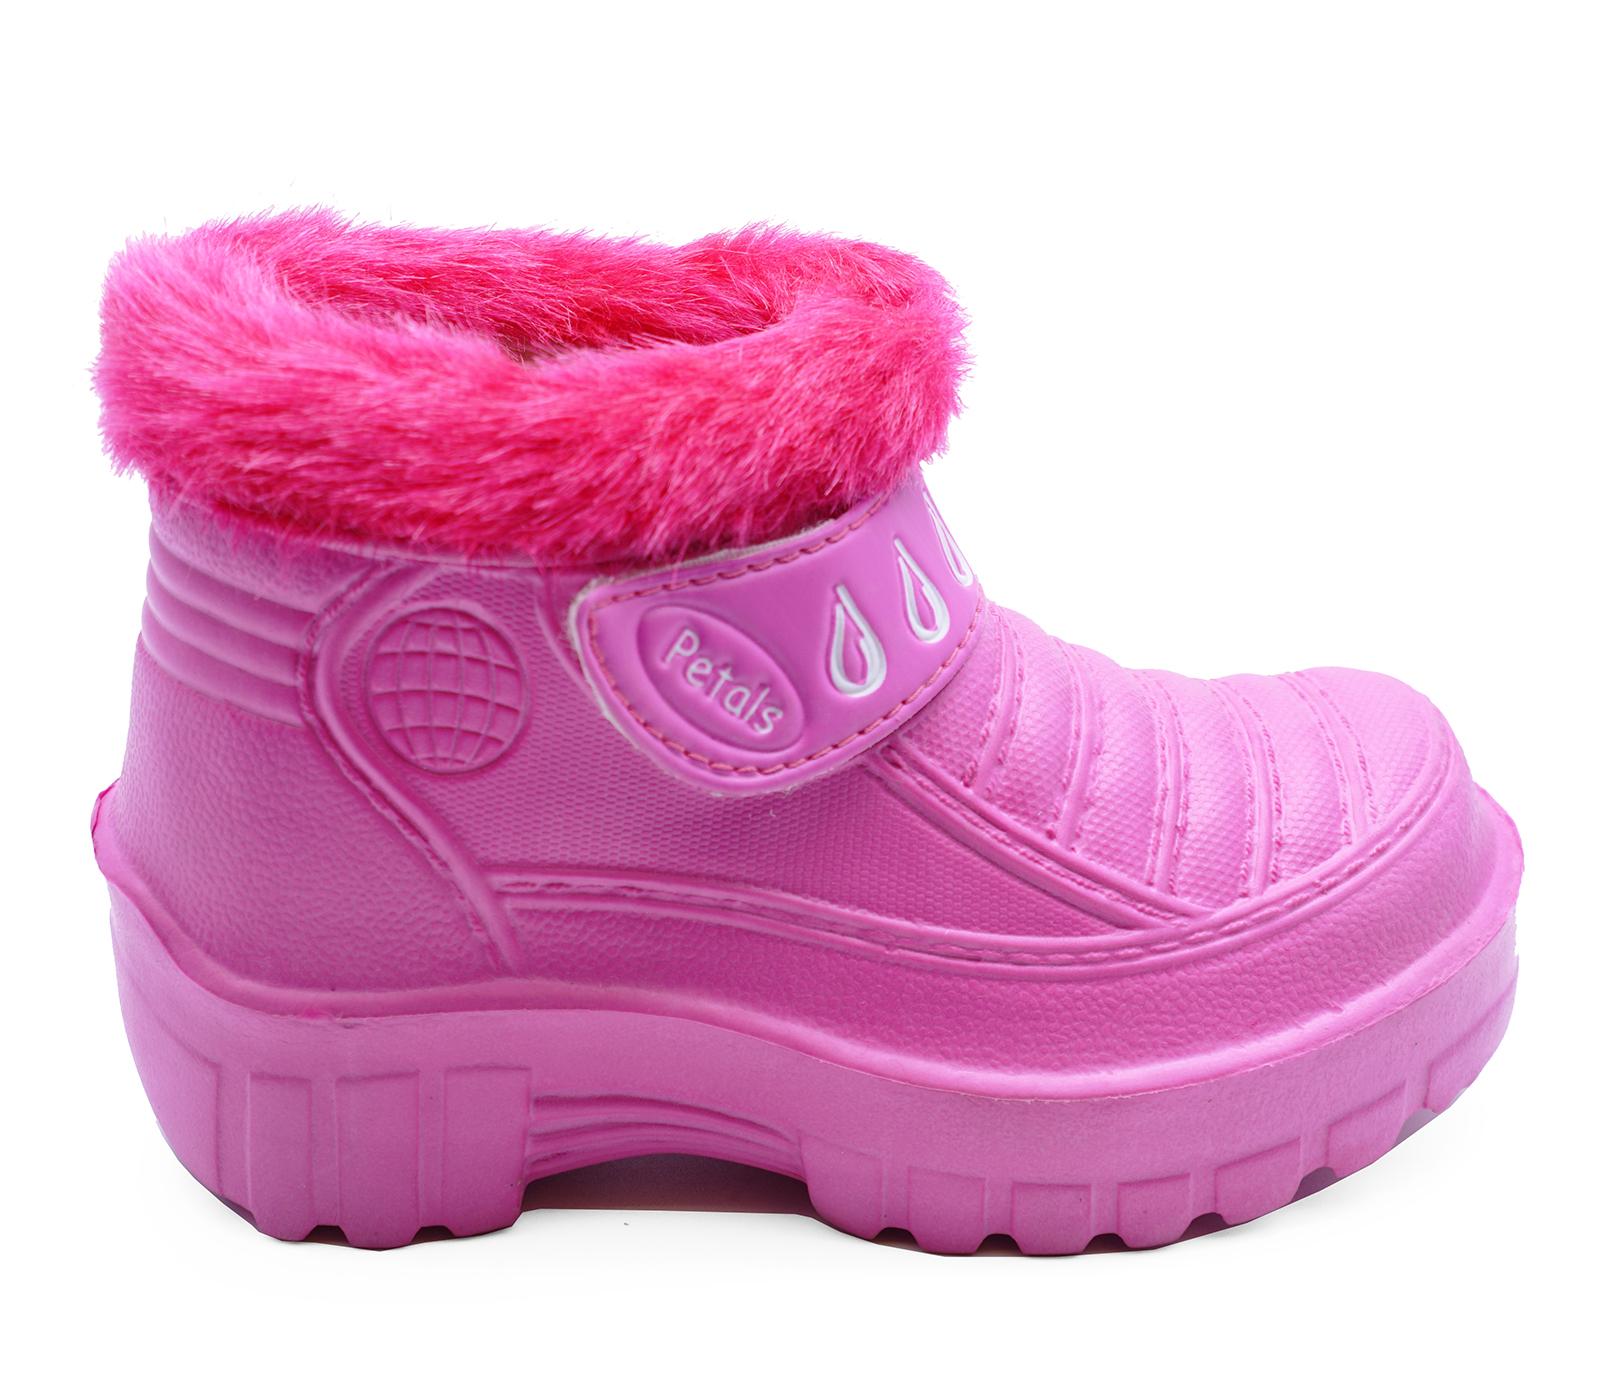 KIDS GIRLS CHILDRENS PINK EVA SPLASH SNOW FLAT RAIN ANKLE BOOTS SHOES SIZES 11-2